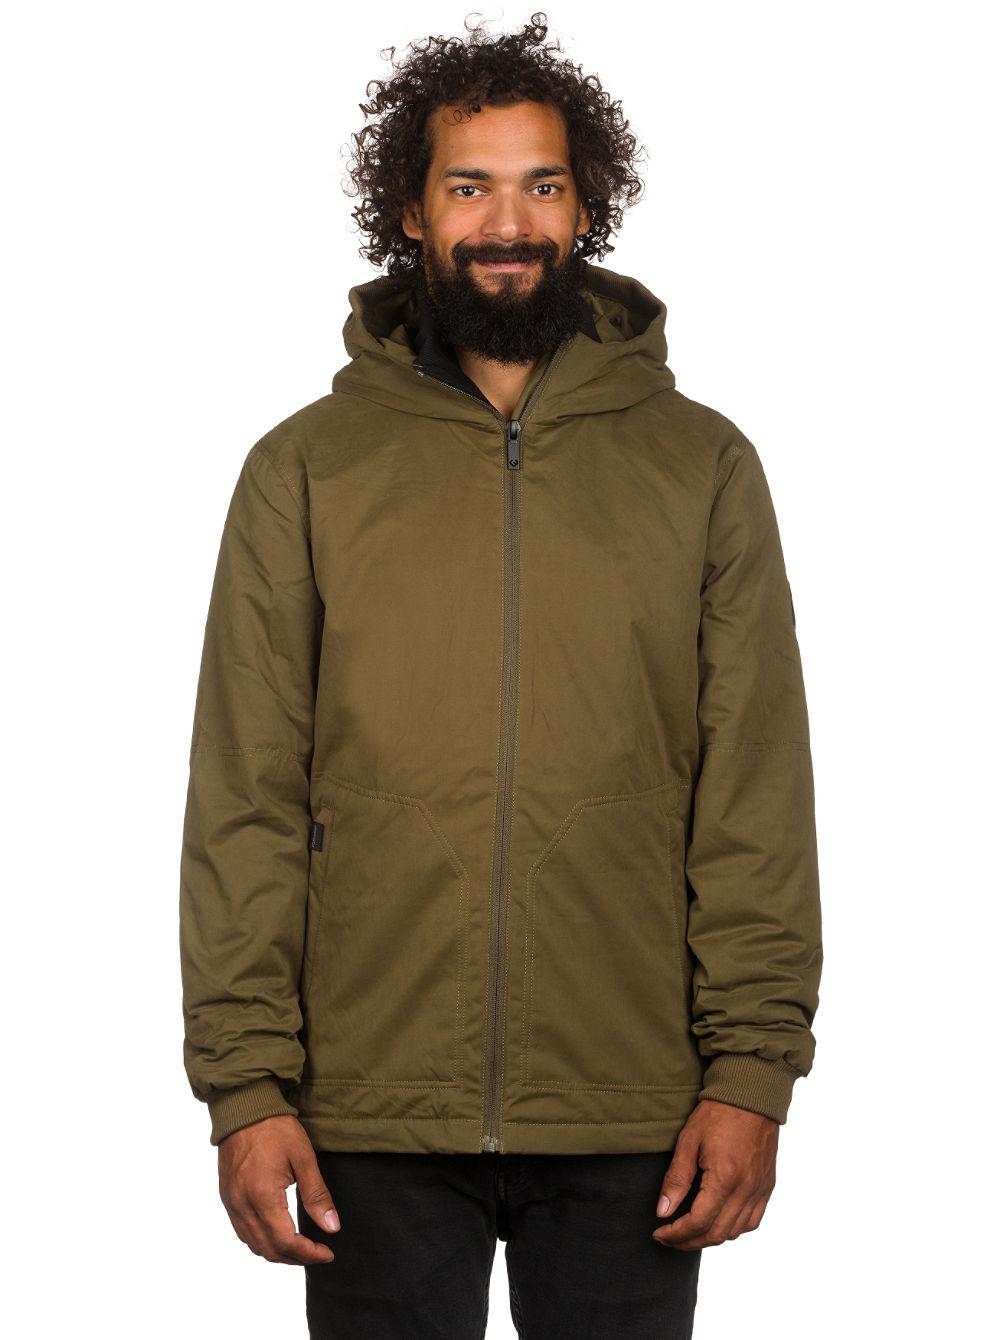 ragwear-olsen-jacket